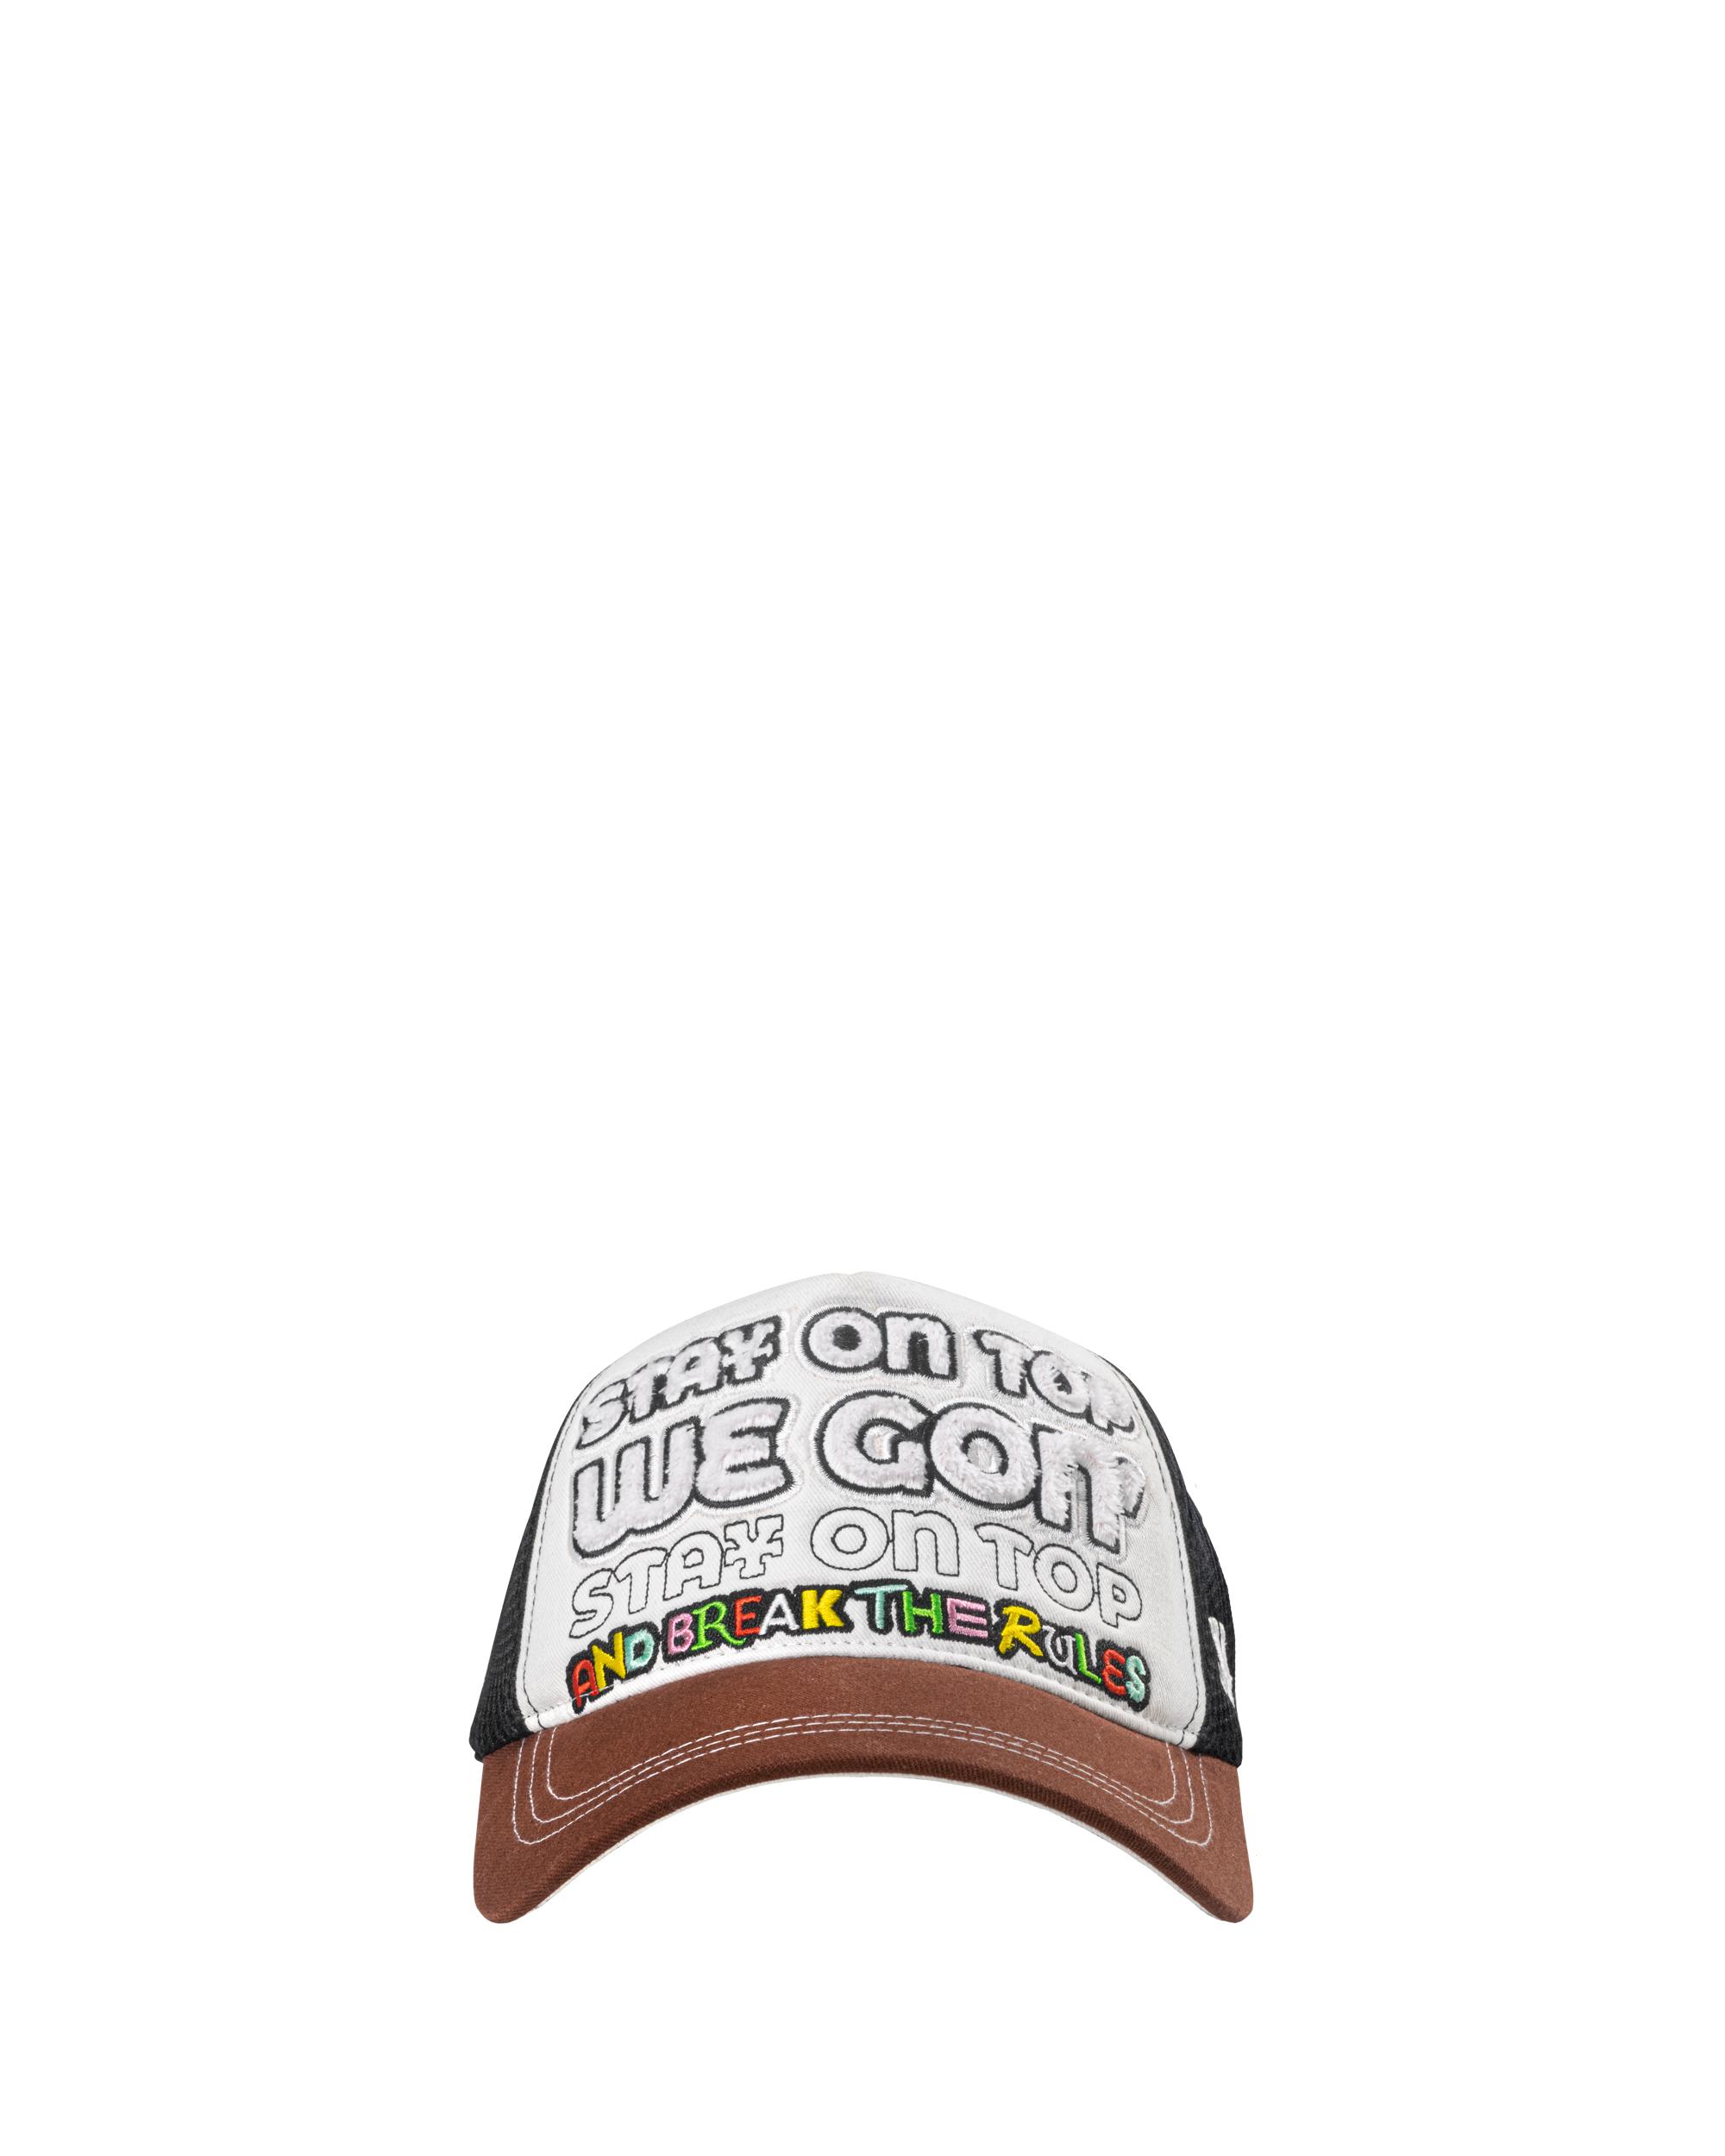 DirtyCoins On Top Trucker Hat - Brown